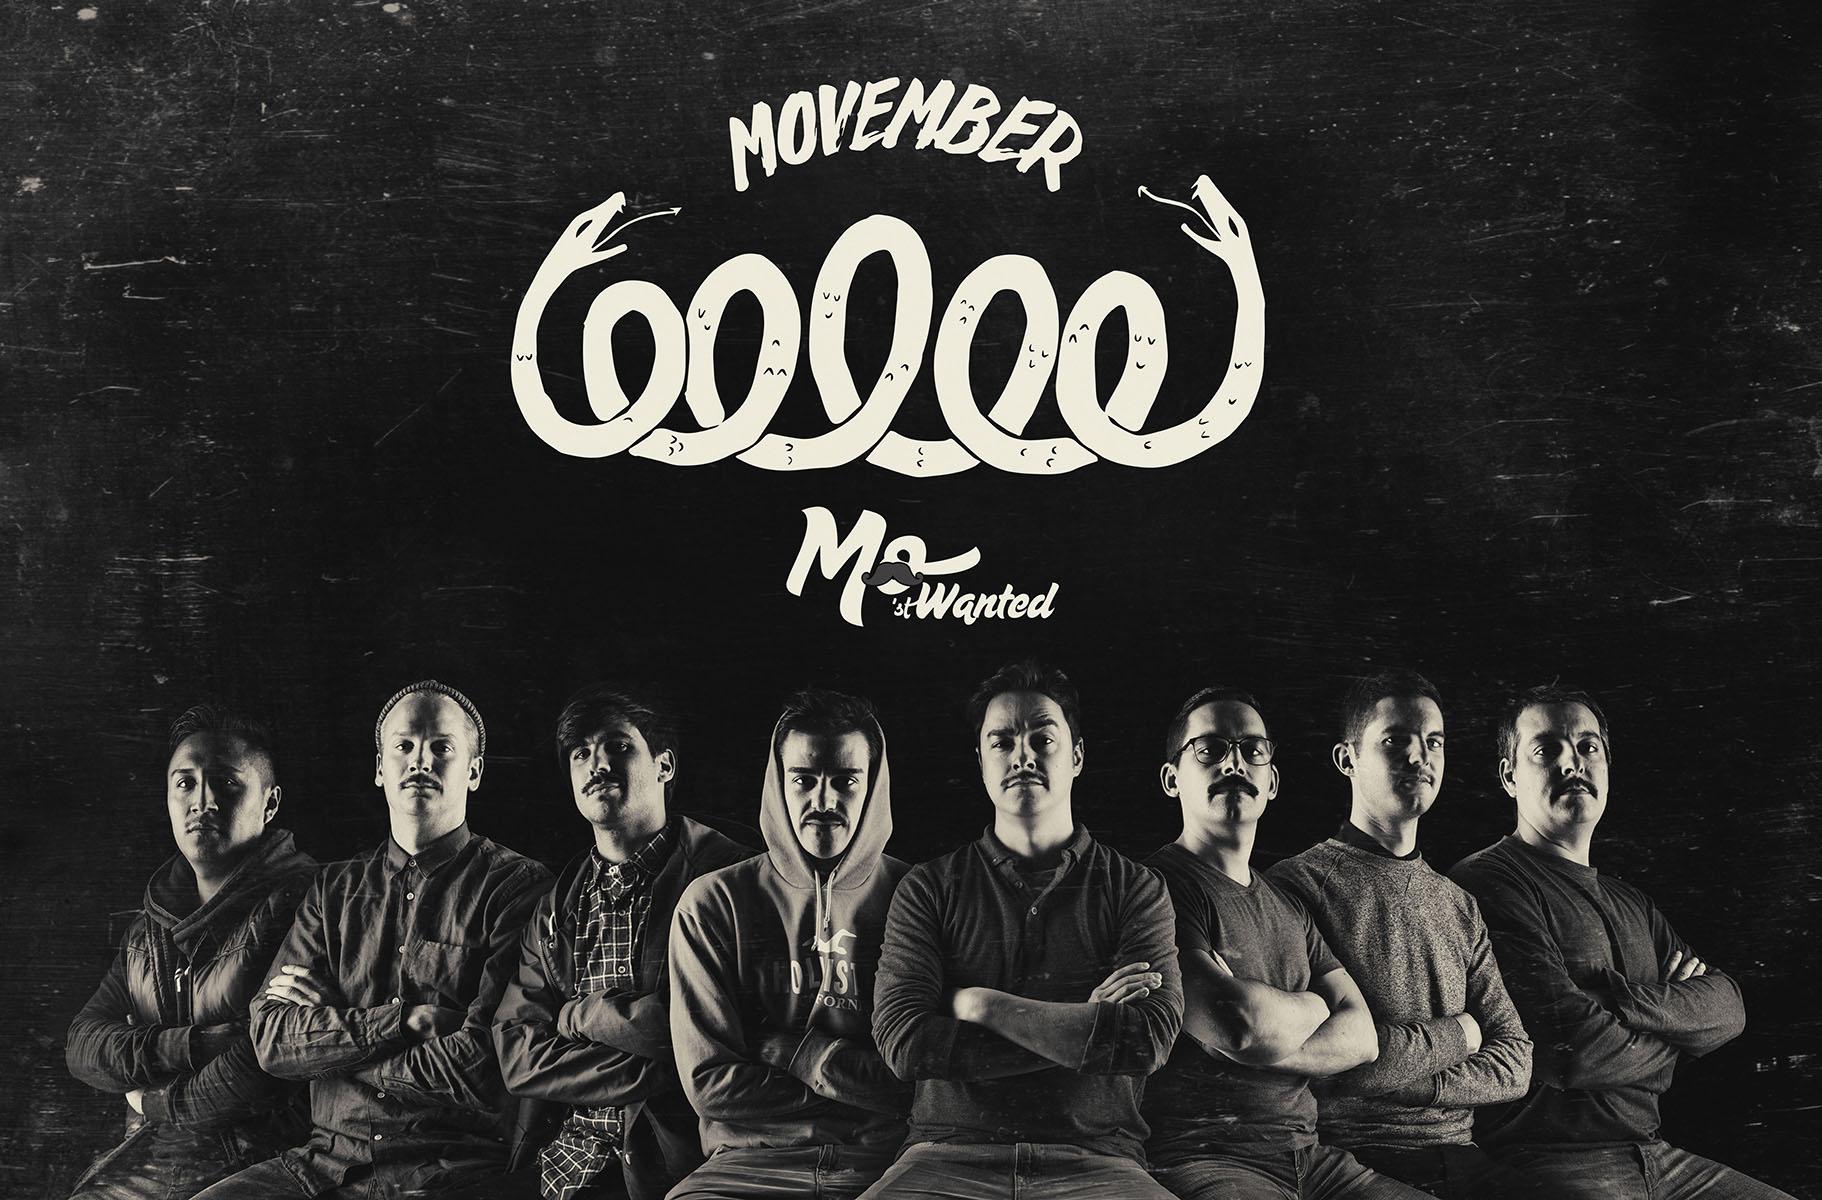 Pepe_Fuster-Movember